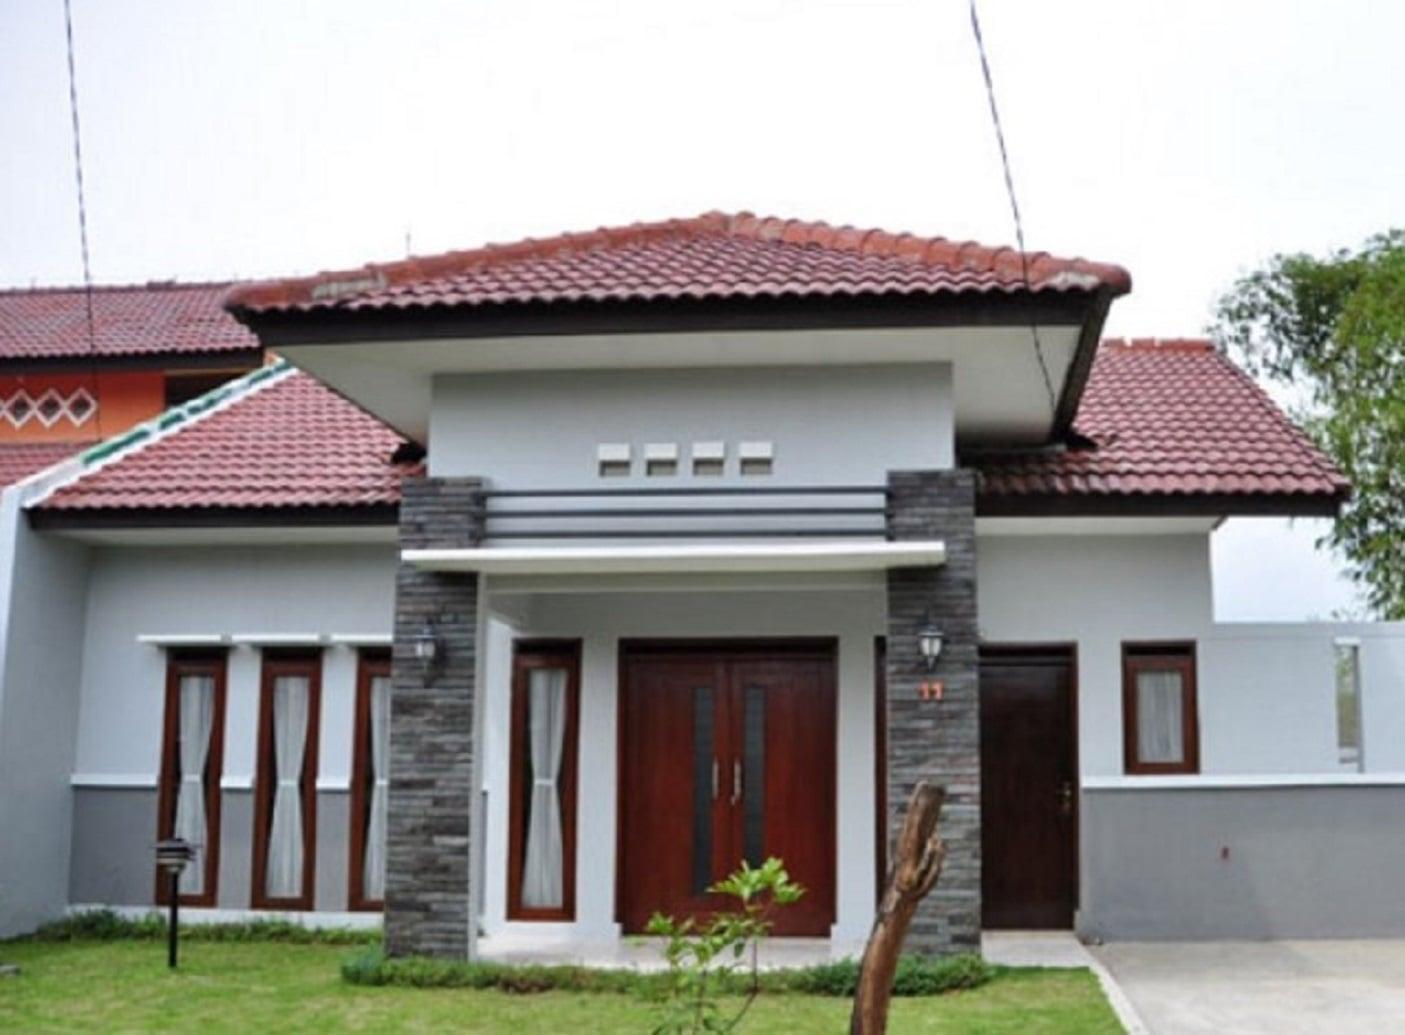 6 Bentuk Rumah Sederhana Di Kampung Yang Cantik Dan Asri Rumah di desa sederhana